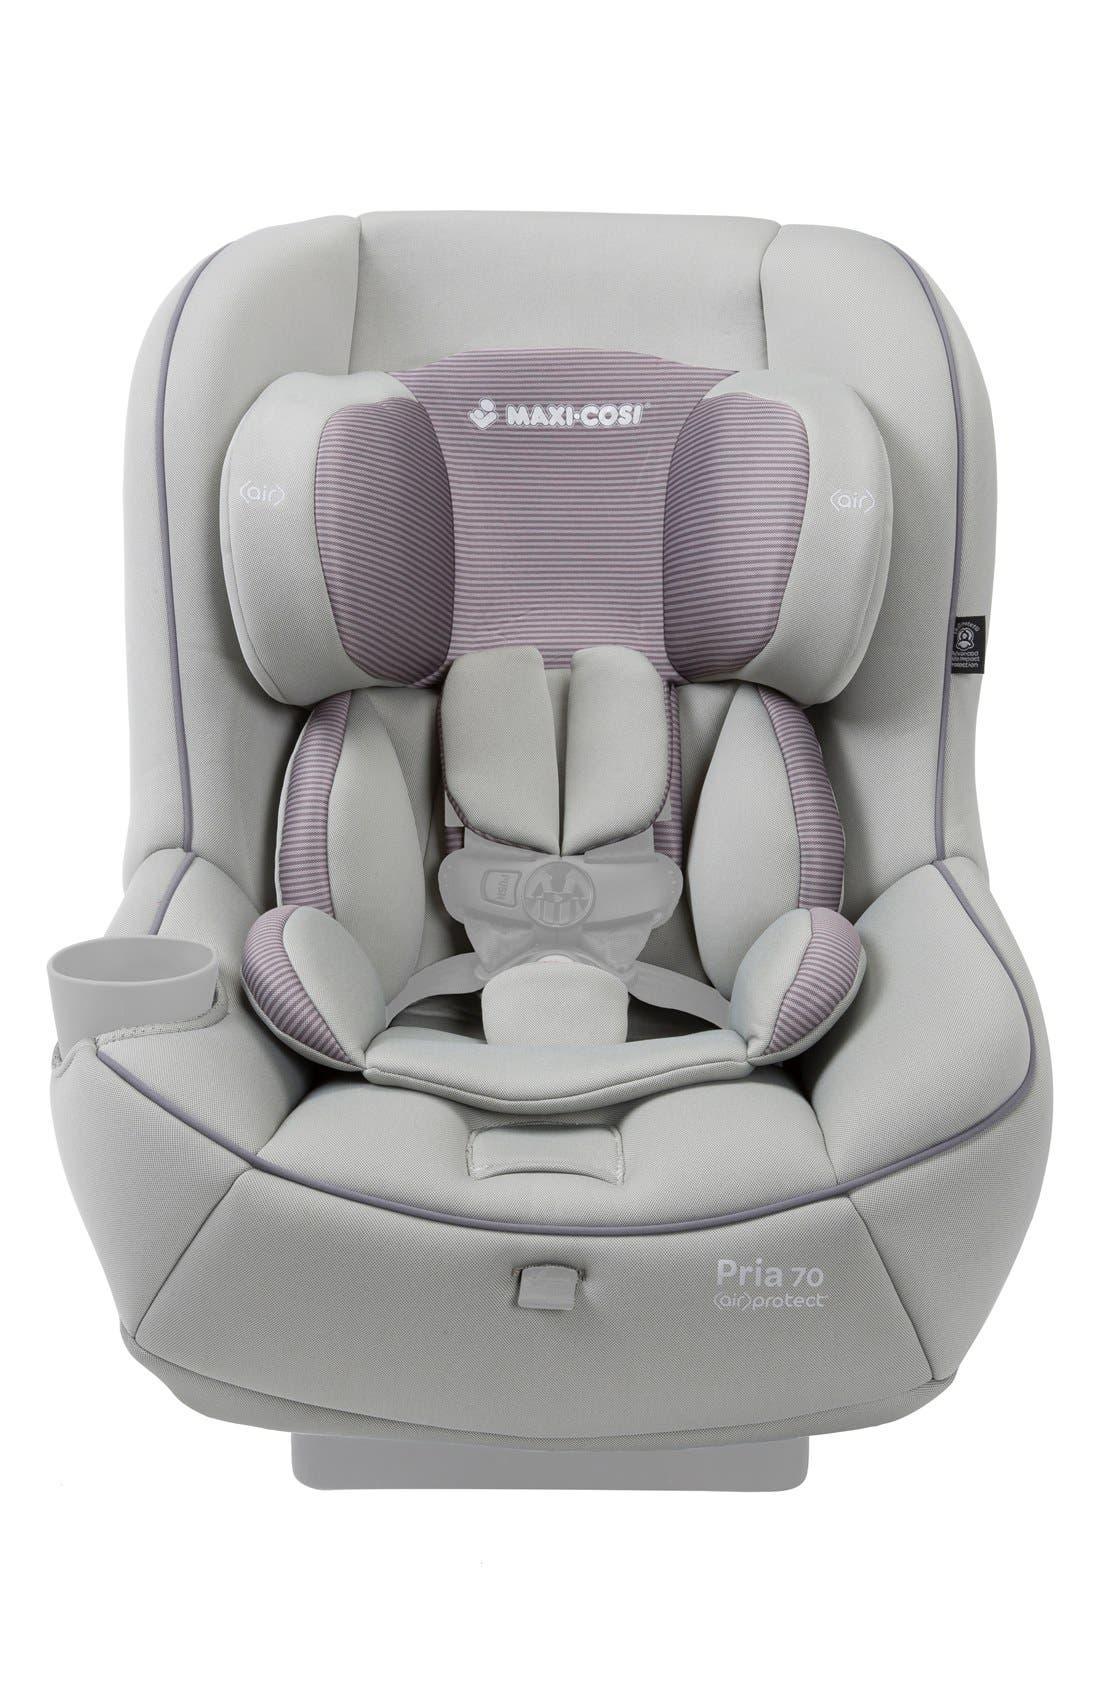 MAXI-COSI® Seat Pad Fashion Kit for Pria™ 70